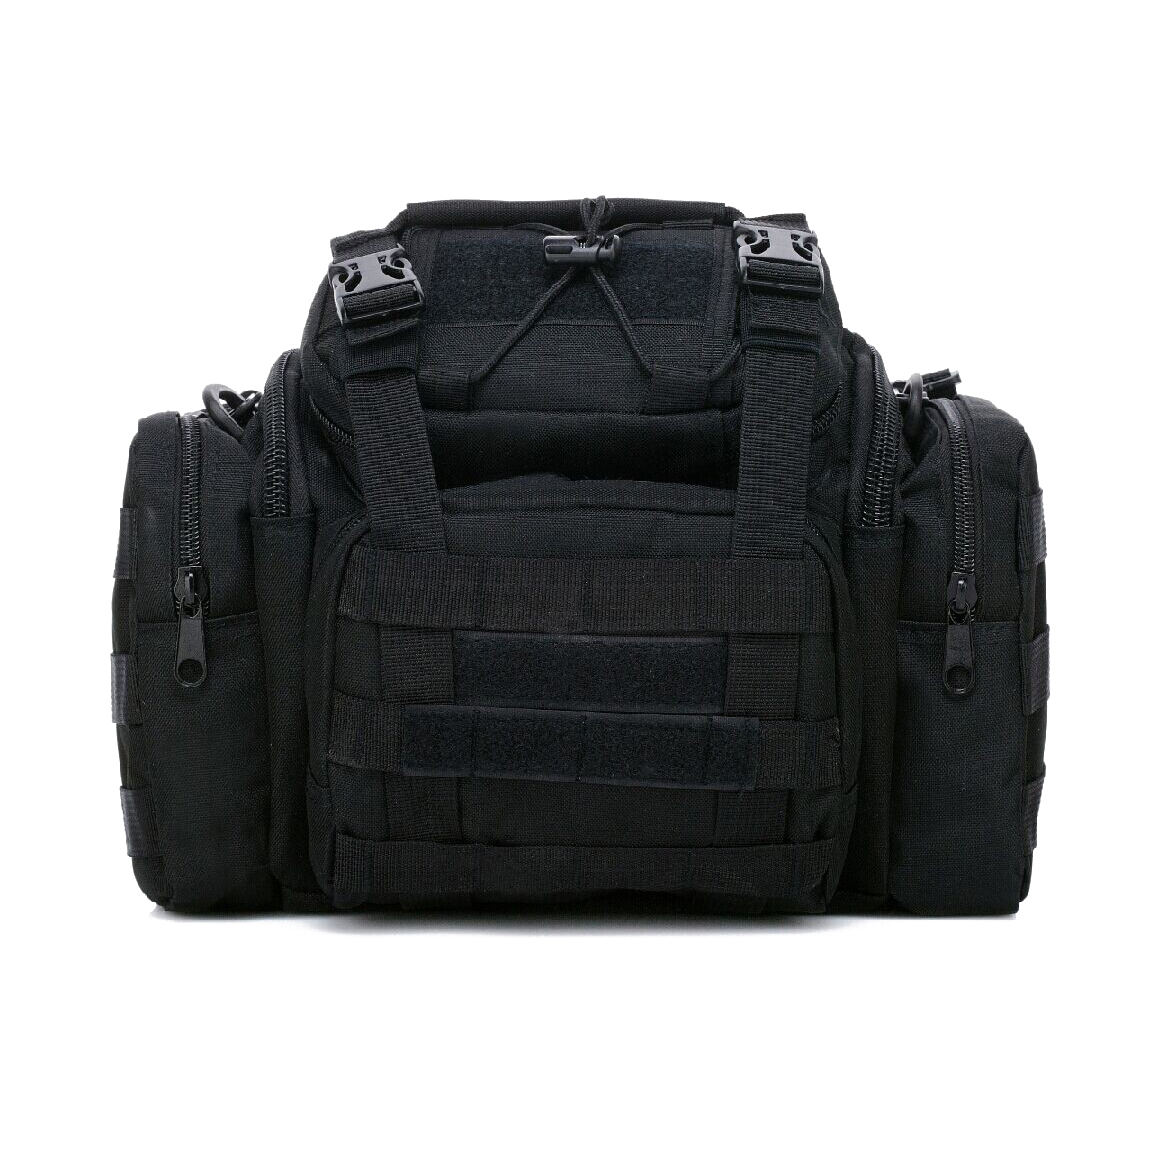 JHO-Sea/<font><b>Carp</b></font>/Fly Fishing Tackle Bag Waterproof Storage Waist Shoulder Carry Case Black